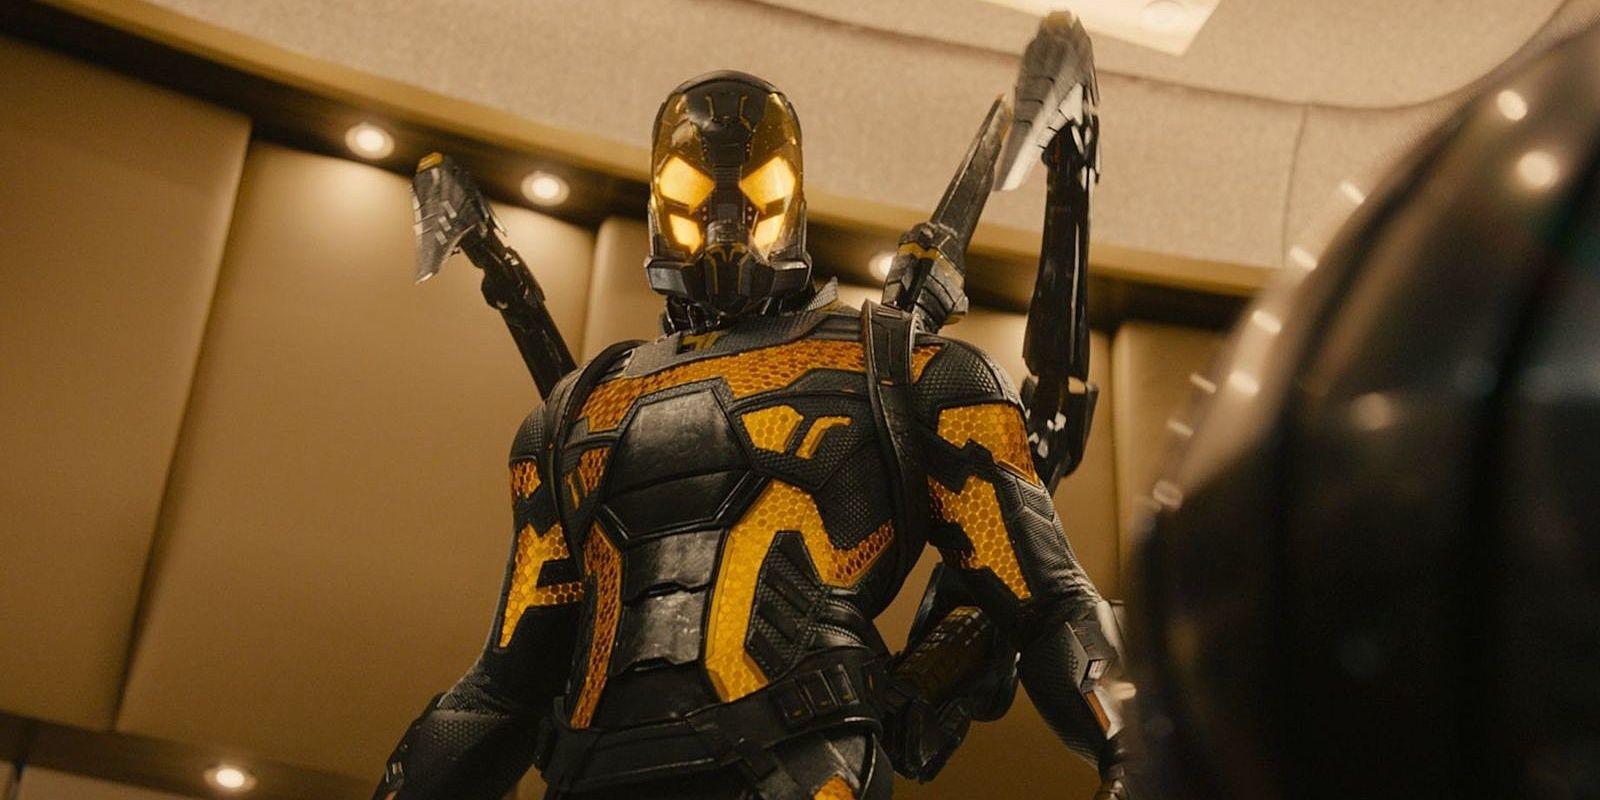 Ant-Man 3 Star May Have Spoiled A Major Villain Return